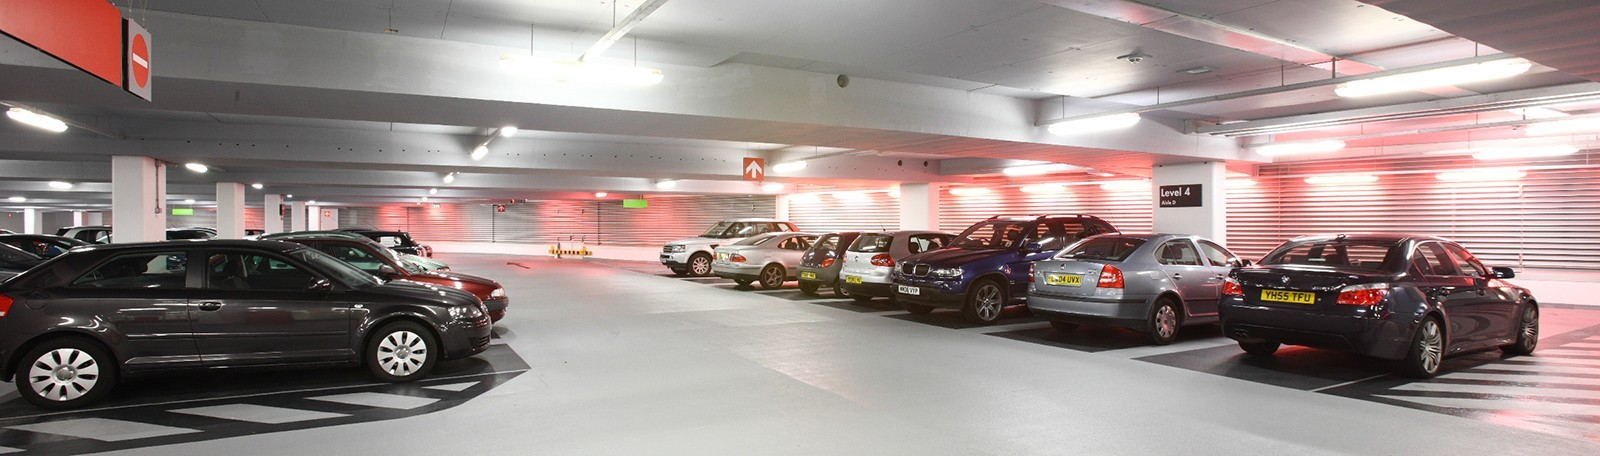 Parking Gare - Parkeren in Valence | Q-Park